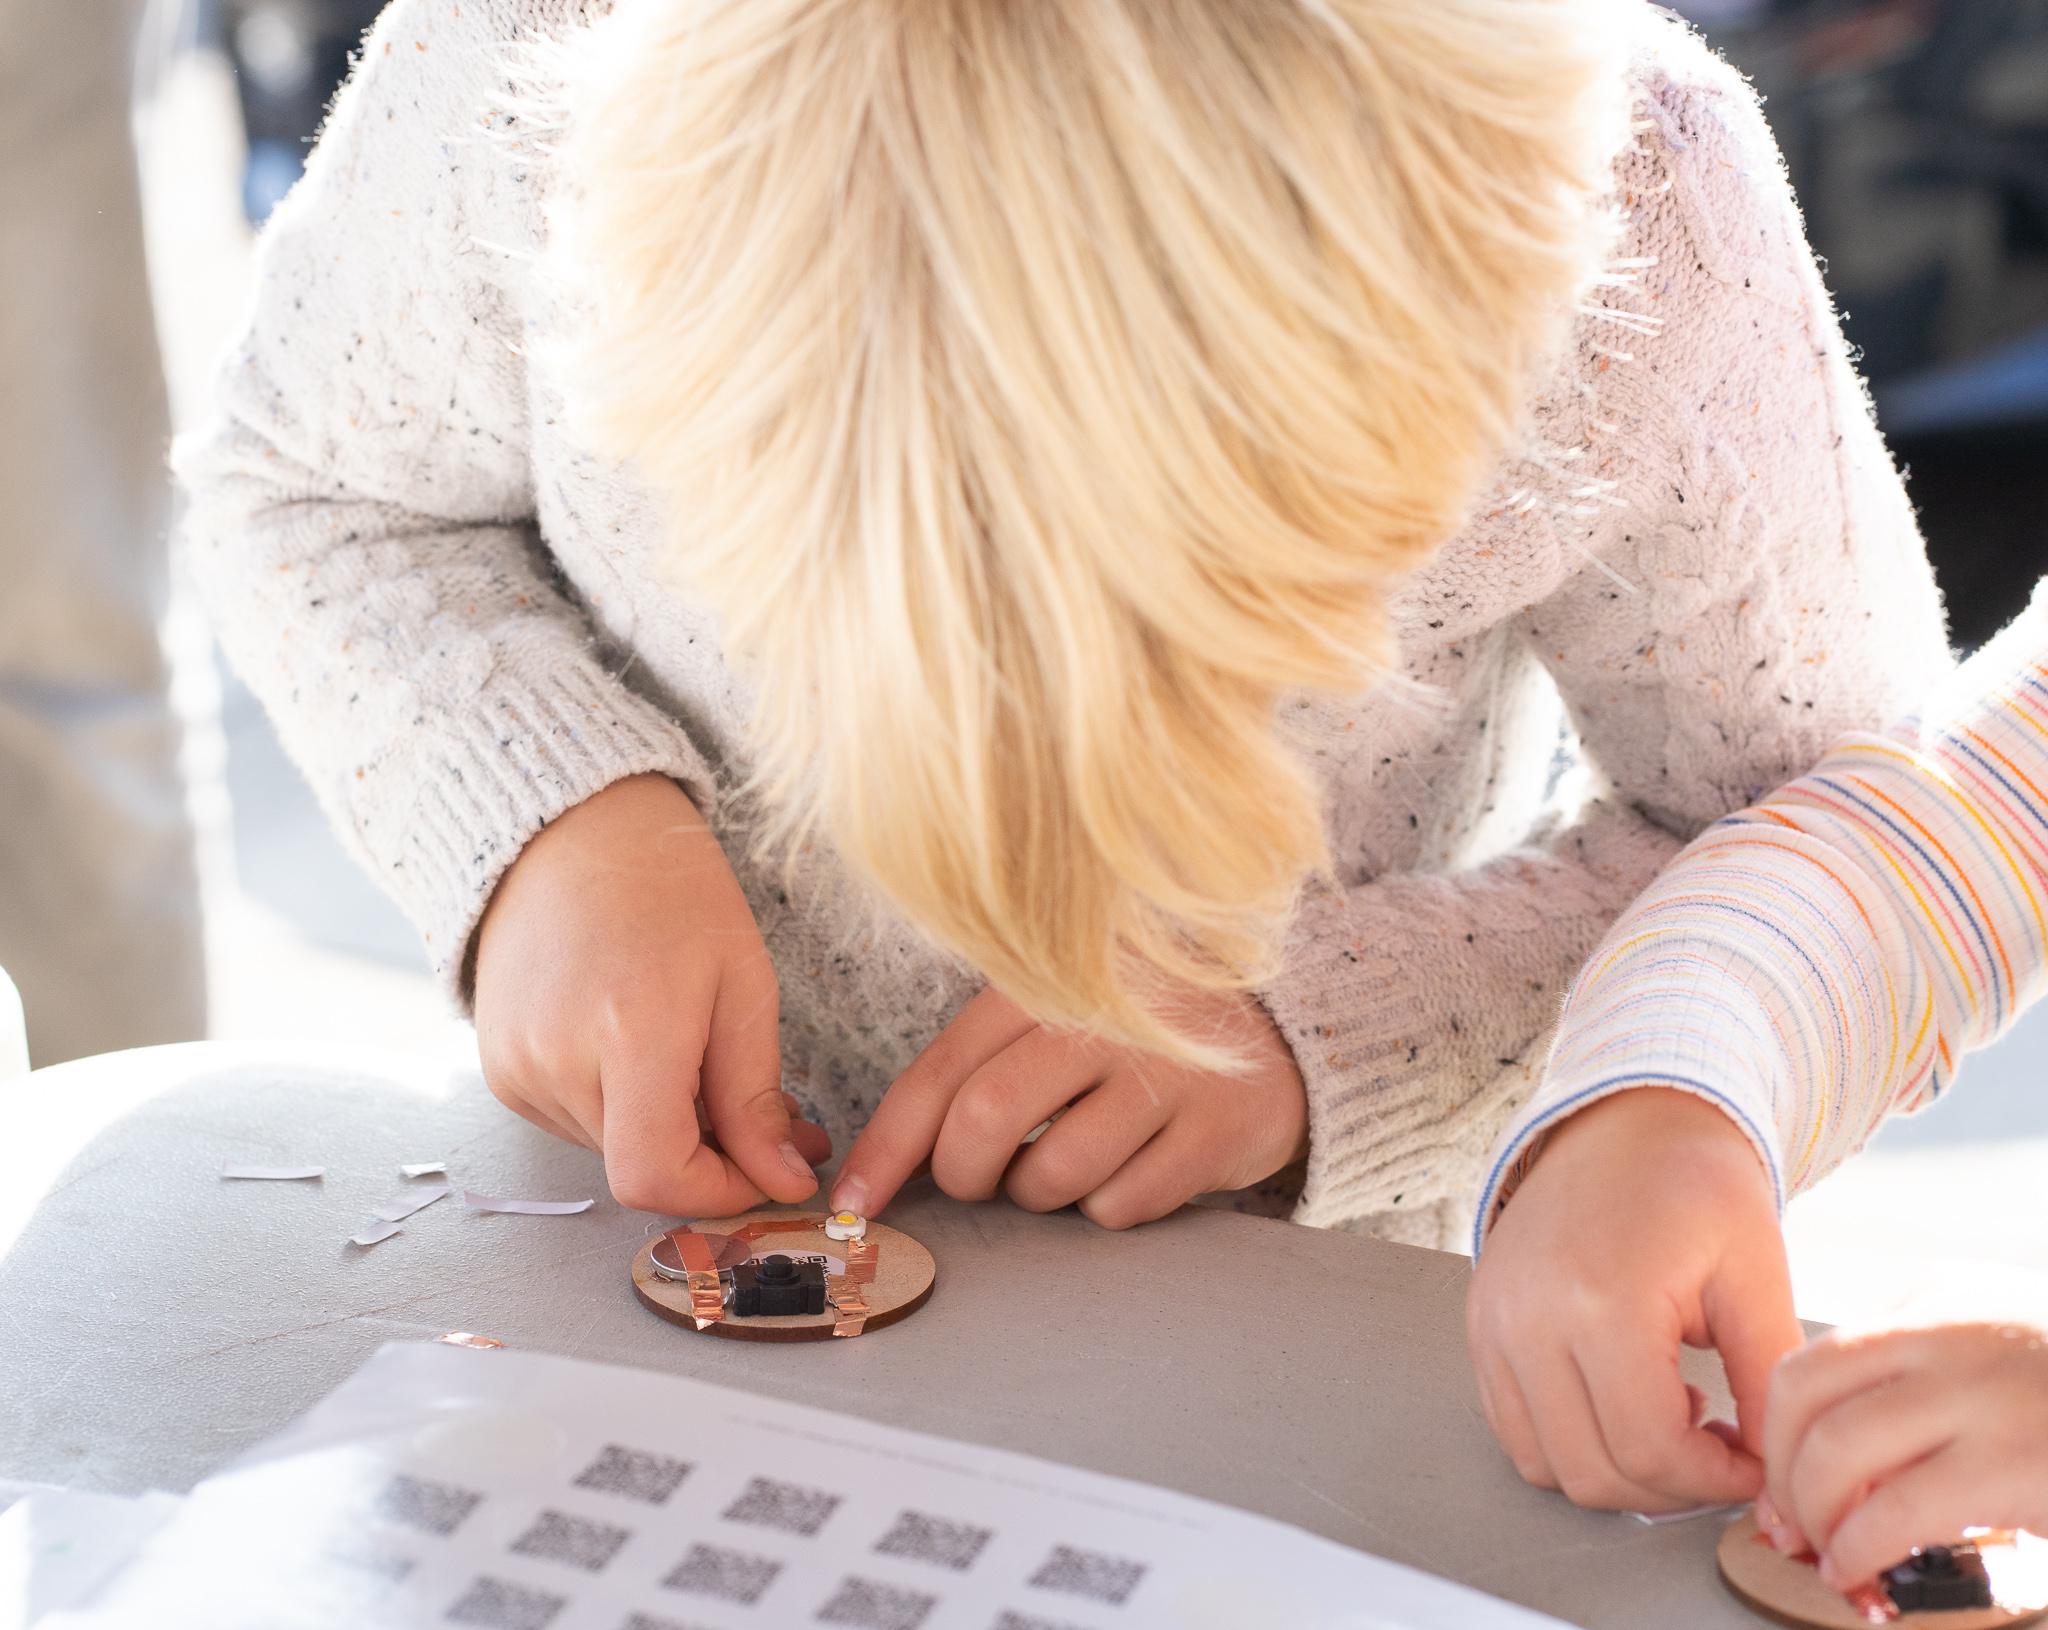 boy with blonde hair making a circuit badge in Lumo Workshop